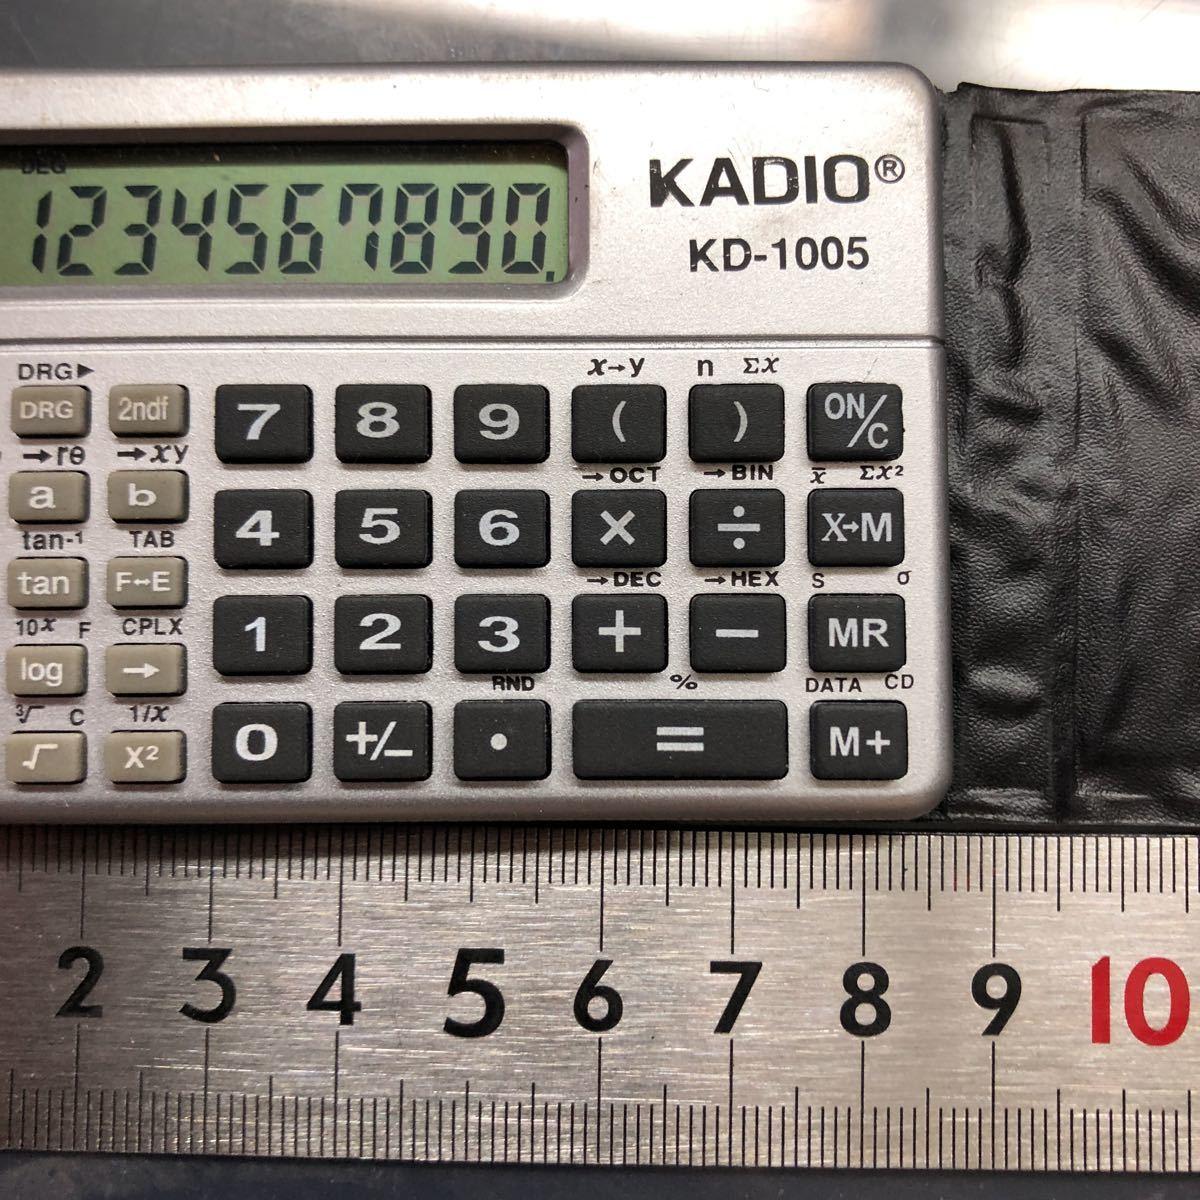 KADIO KD-1005 物凄く小さい関数電卓中古美品_画像3